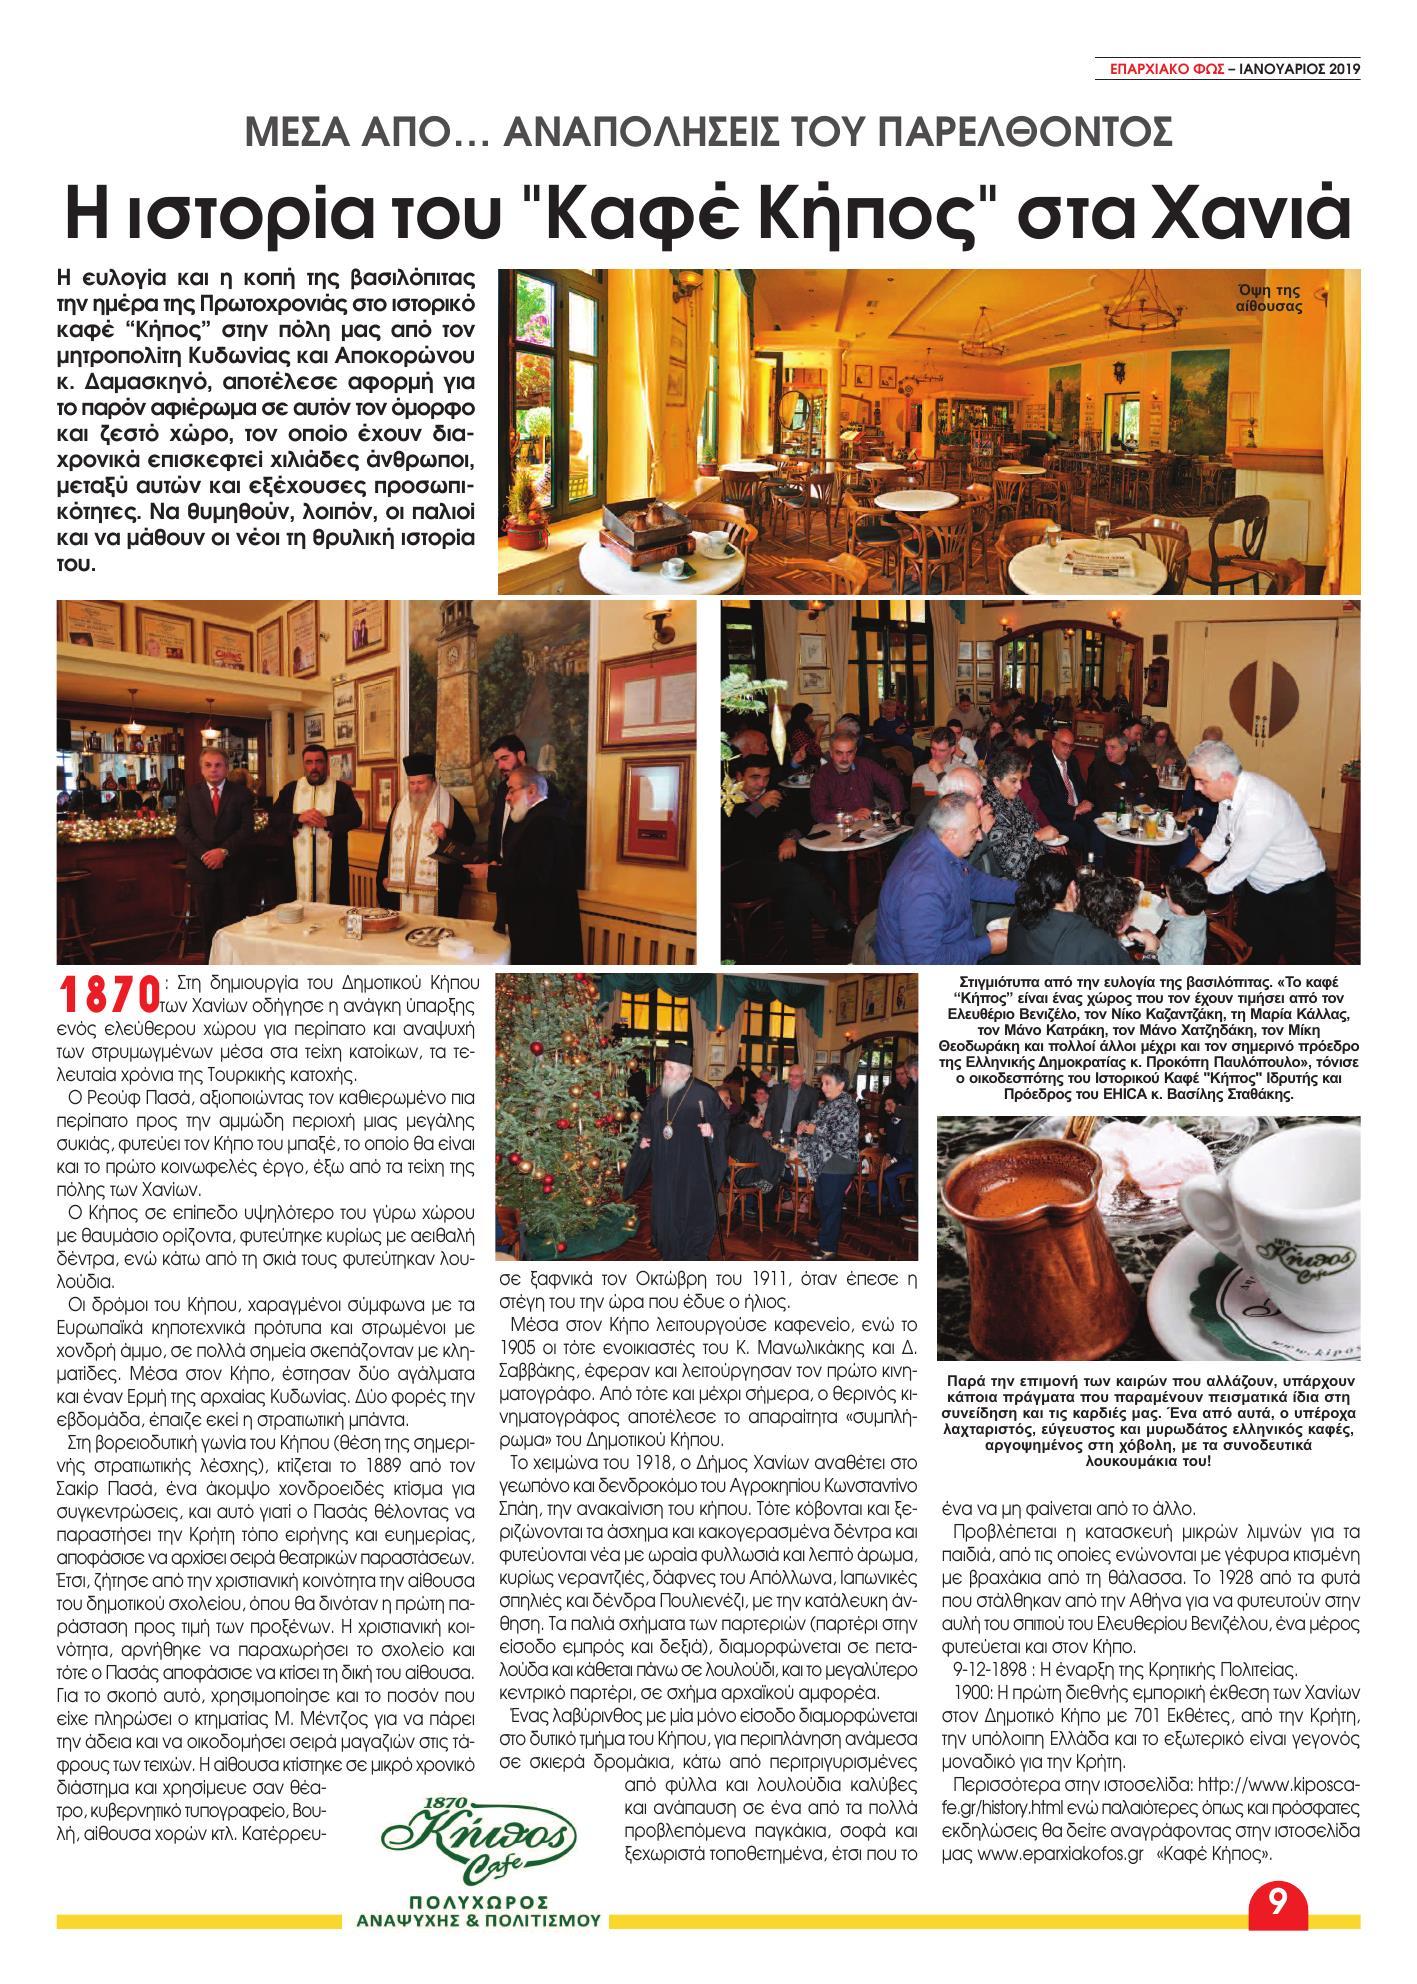 23 KAKANOULHS (Page 09)